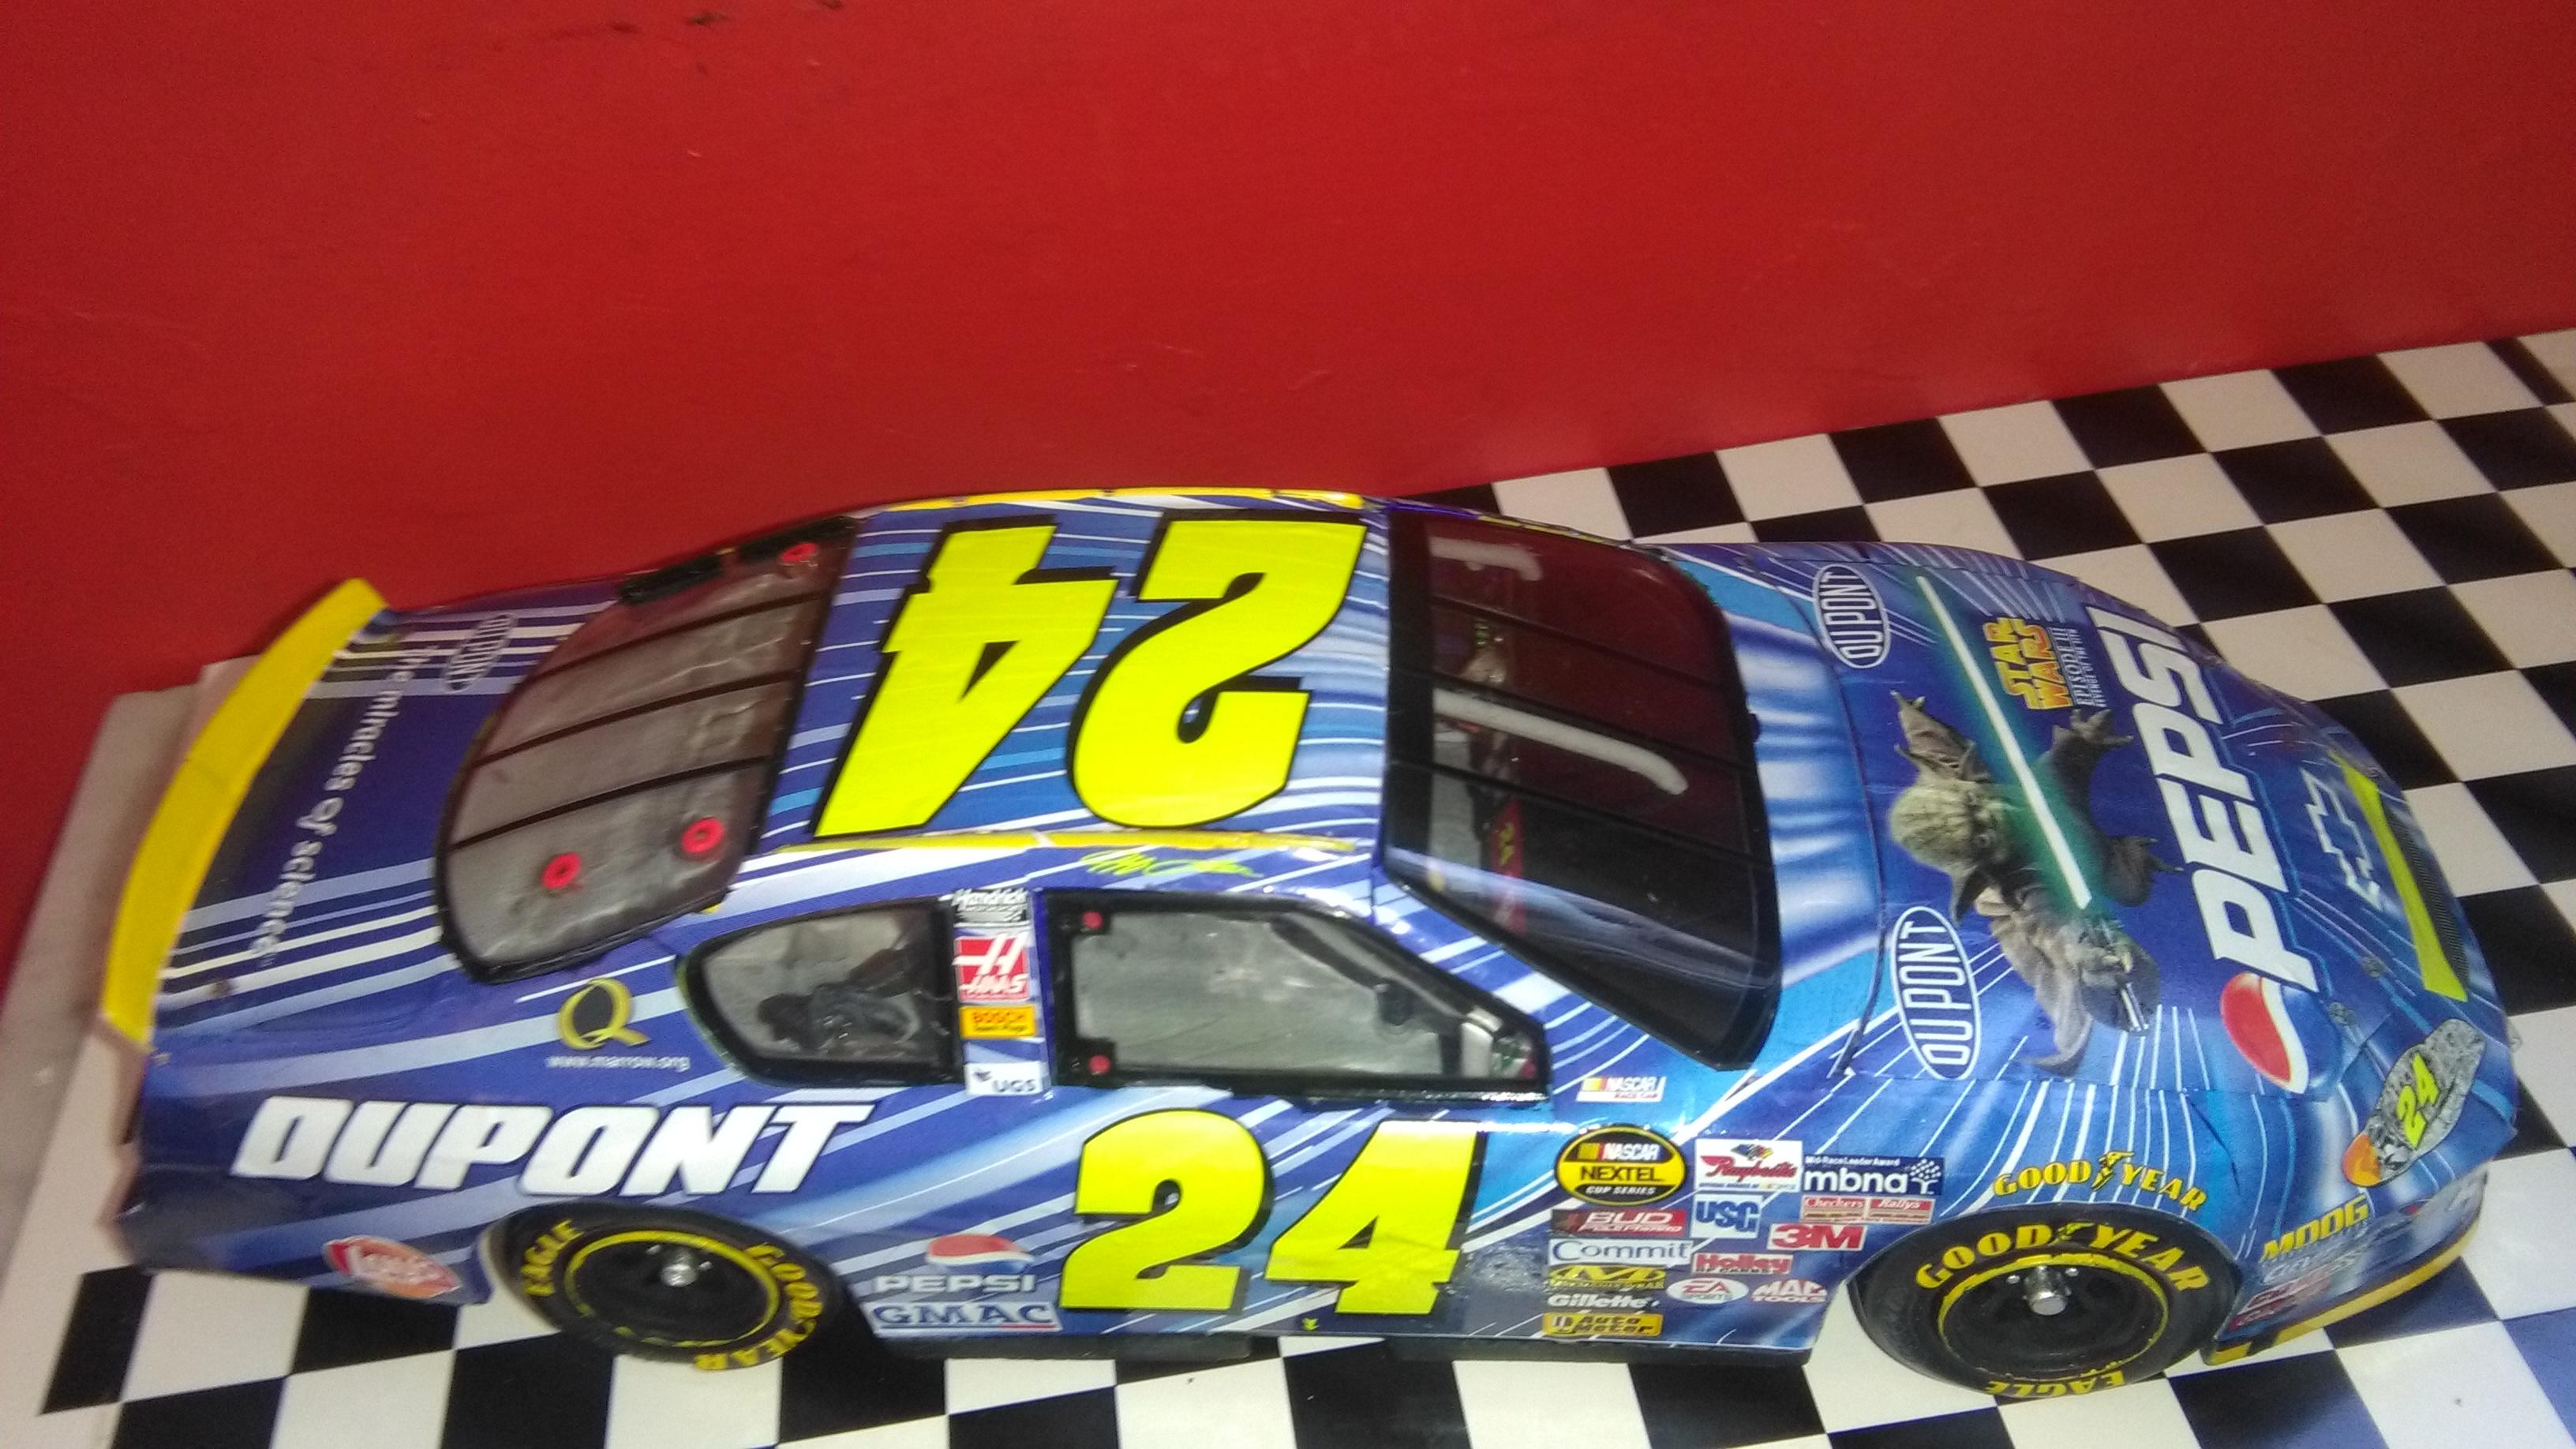 Chevy Monte-Carlo 2005 #24 Jeff Gordon Pepsi/Star Wars  123862IMG20170430170048